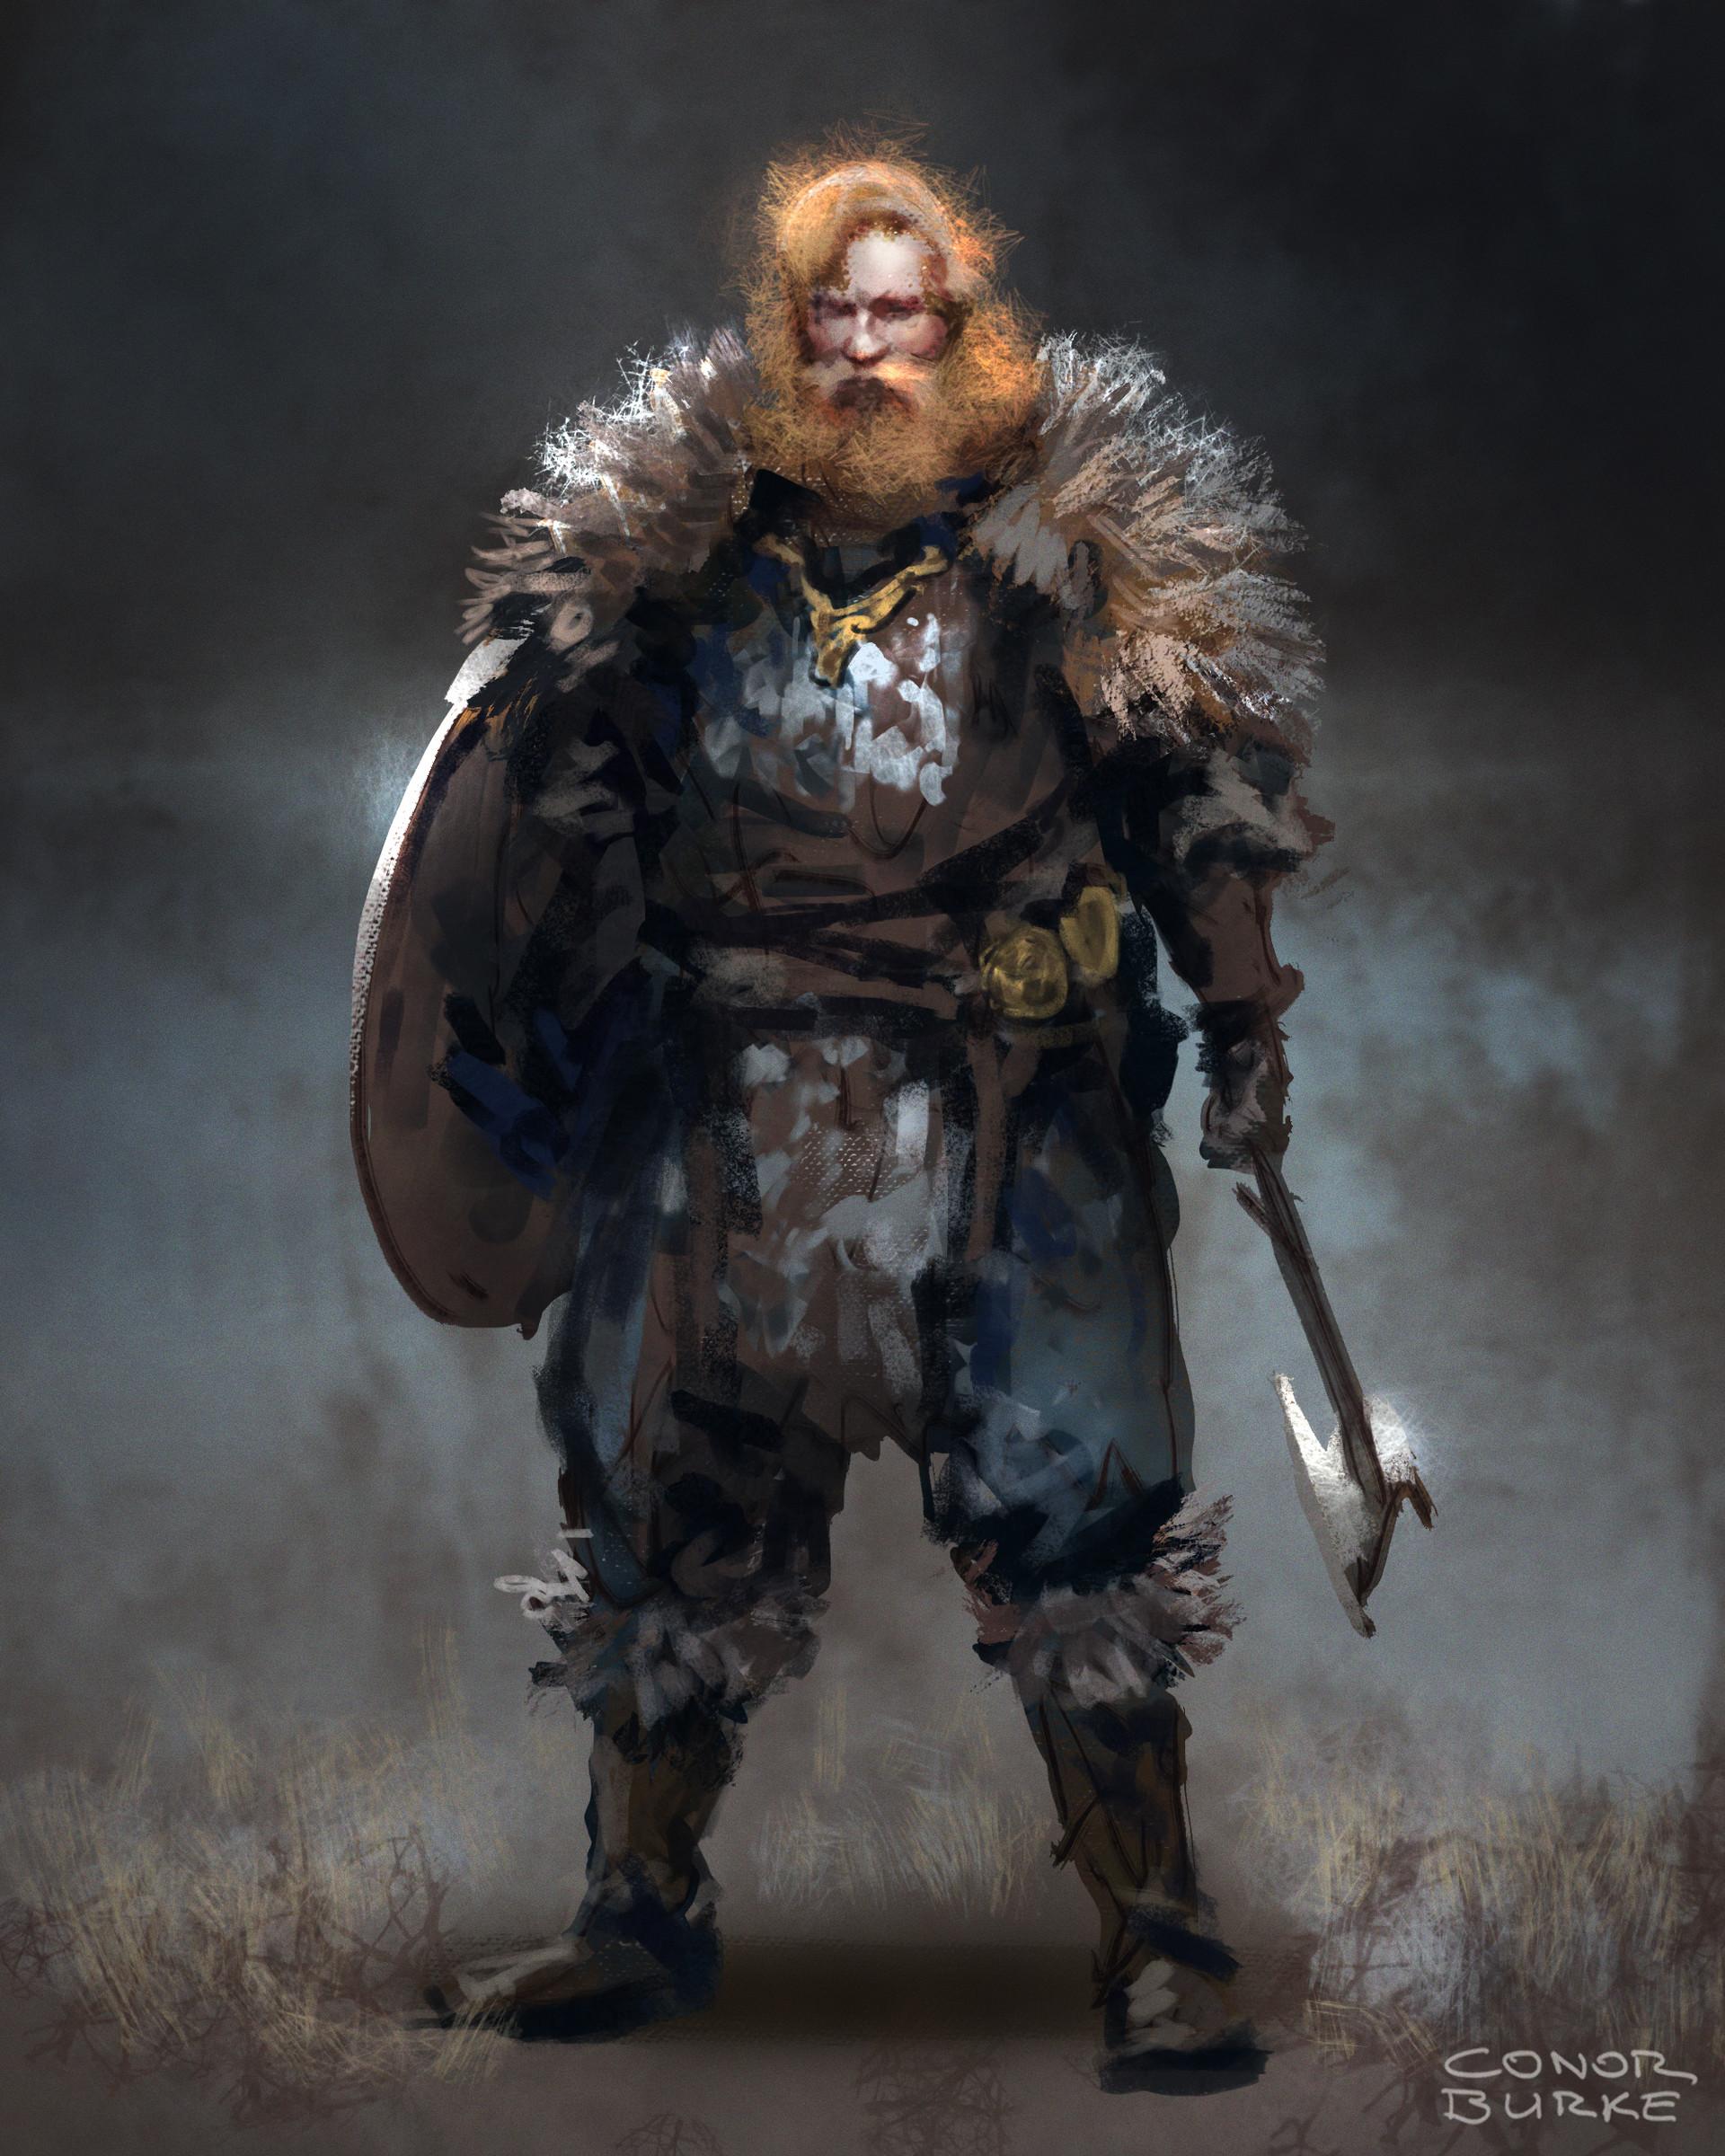 Conor burke 180814 redhex